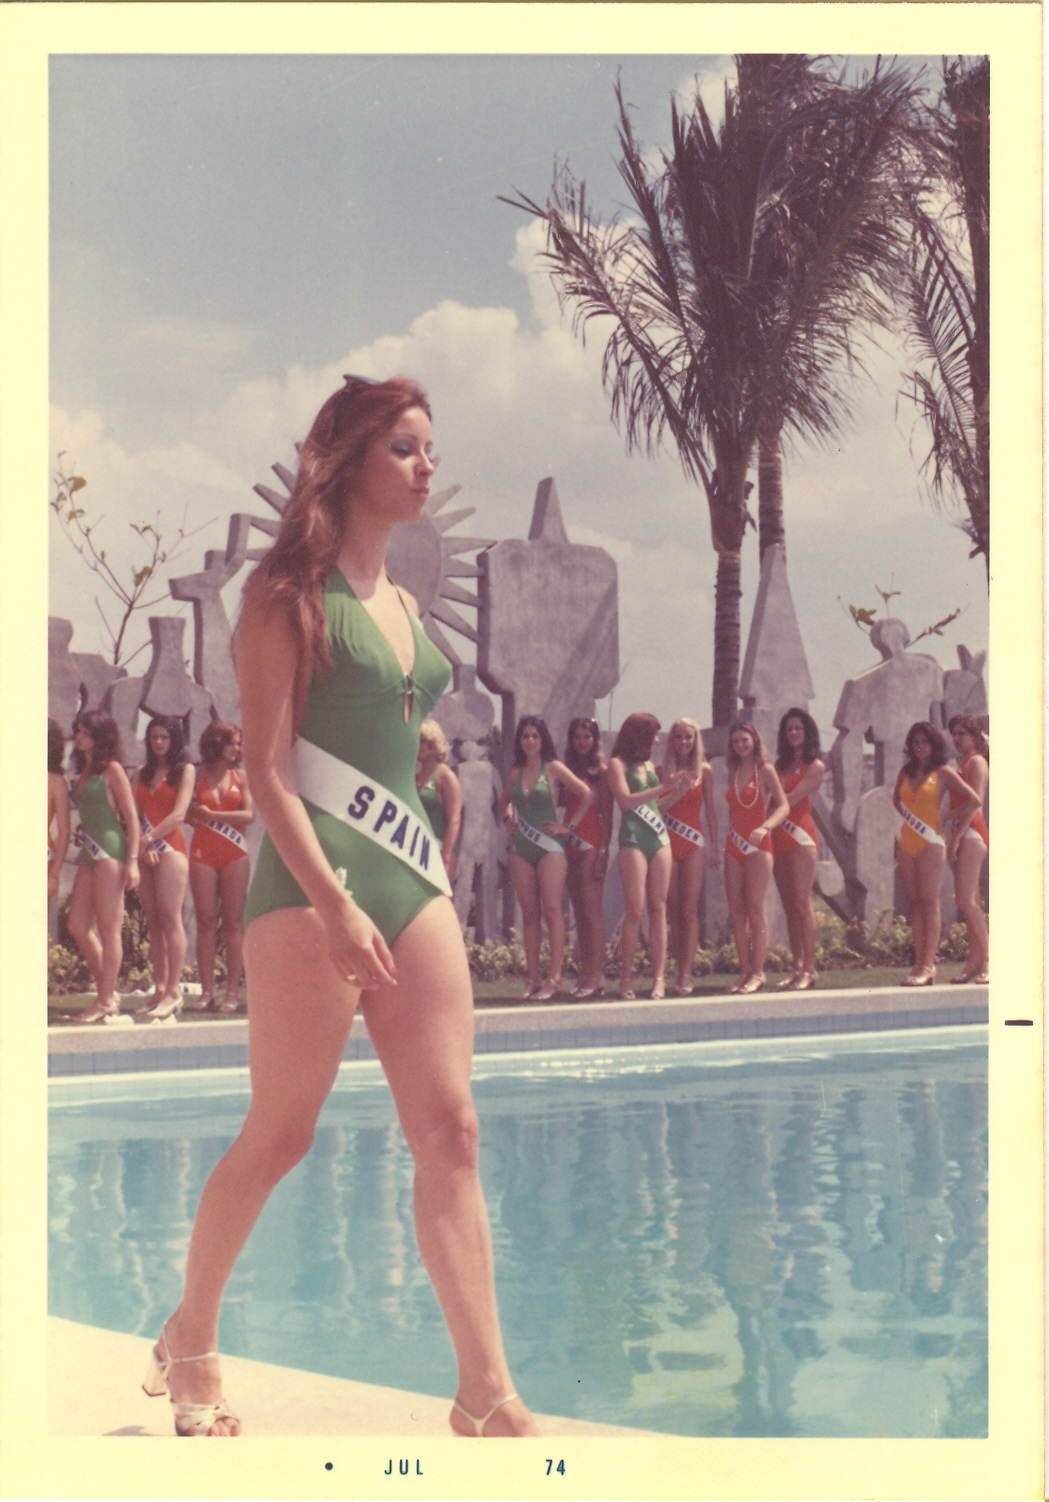 amparo munoz, miss universe 1974. † - Página 2 2896184257_891b54b92a_o